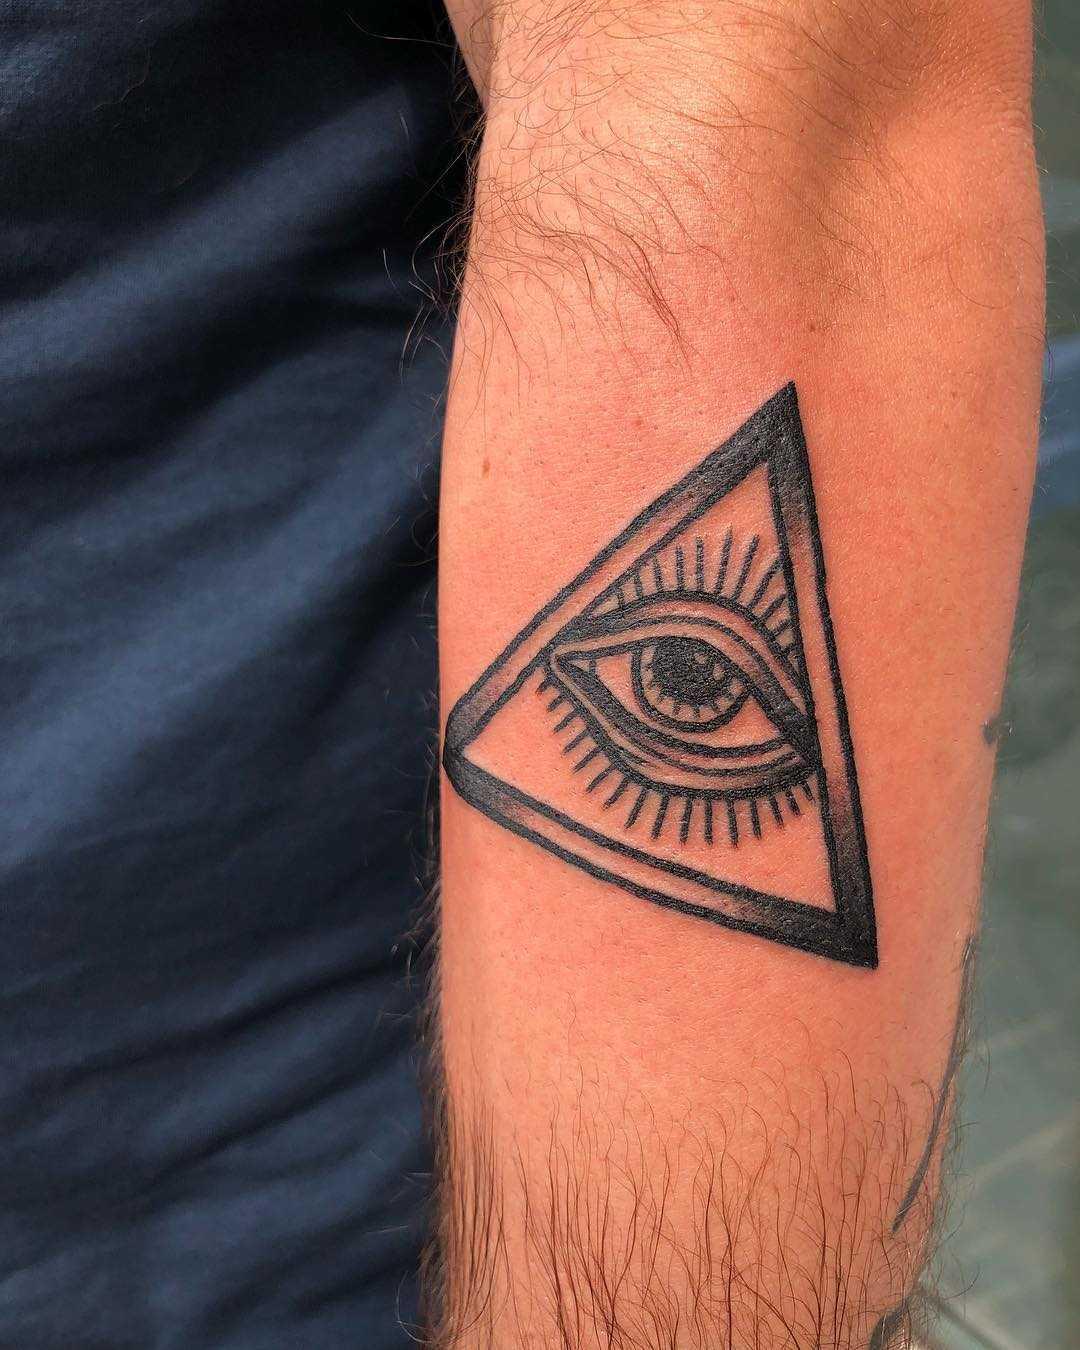 All-seeing eye by Lara Simonetta